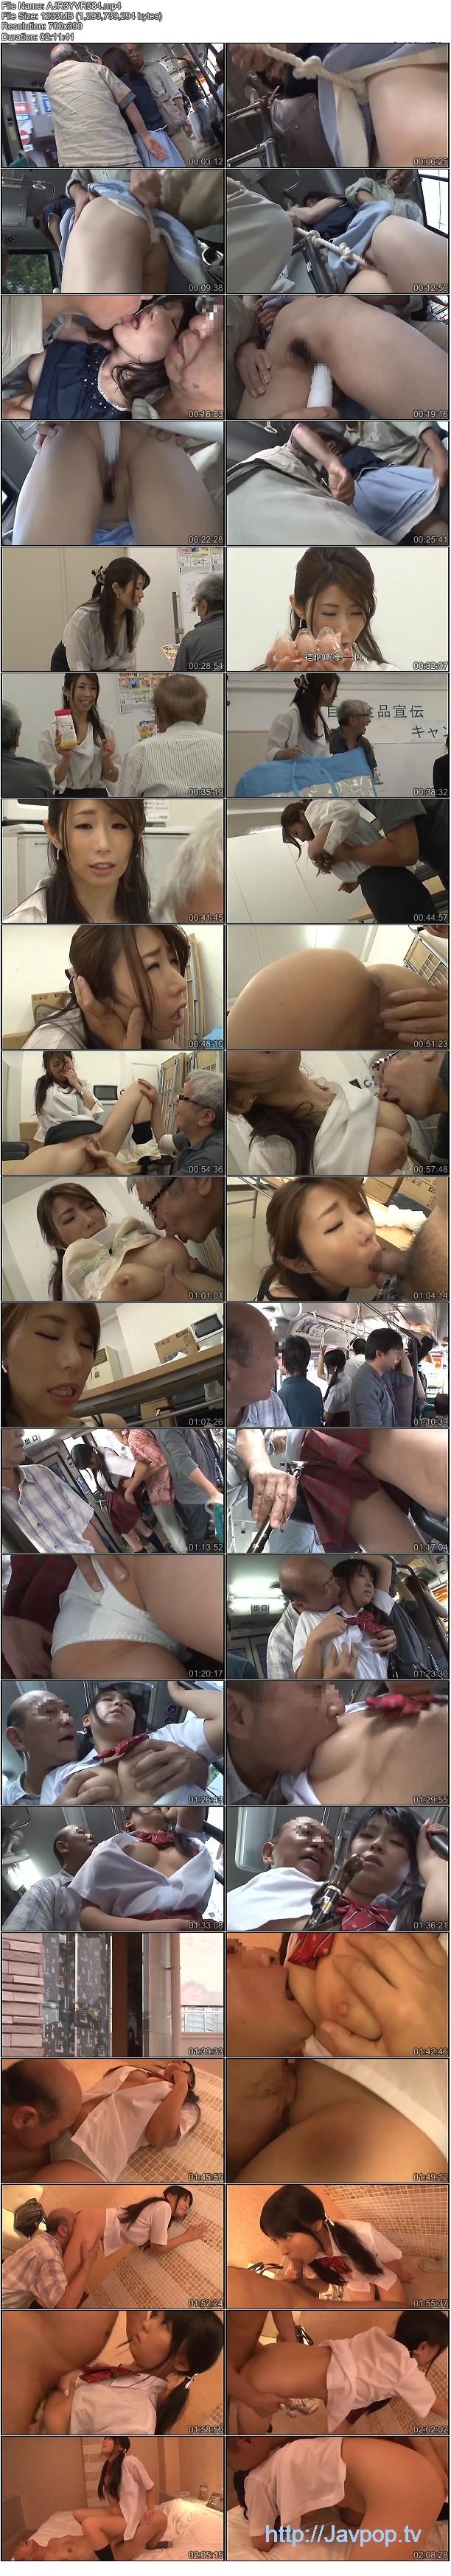 [NHDTA-584] 被大叔搓揉及來回大舔巨乳而高潮的巨乳女生[中文字幕]